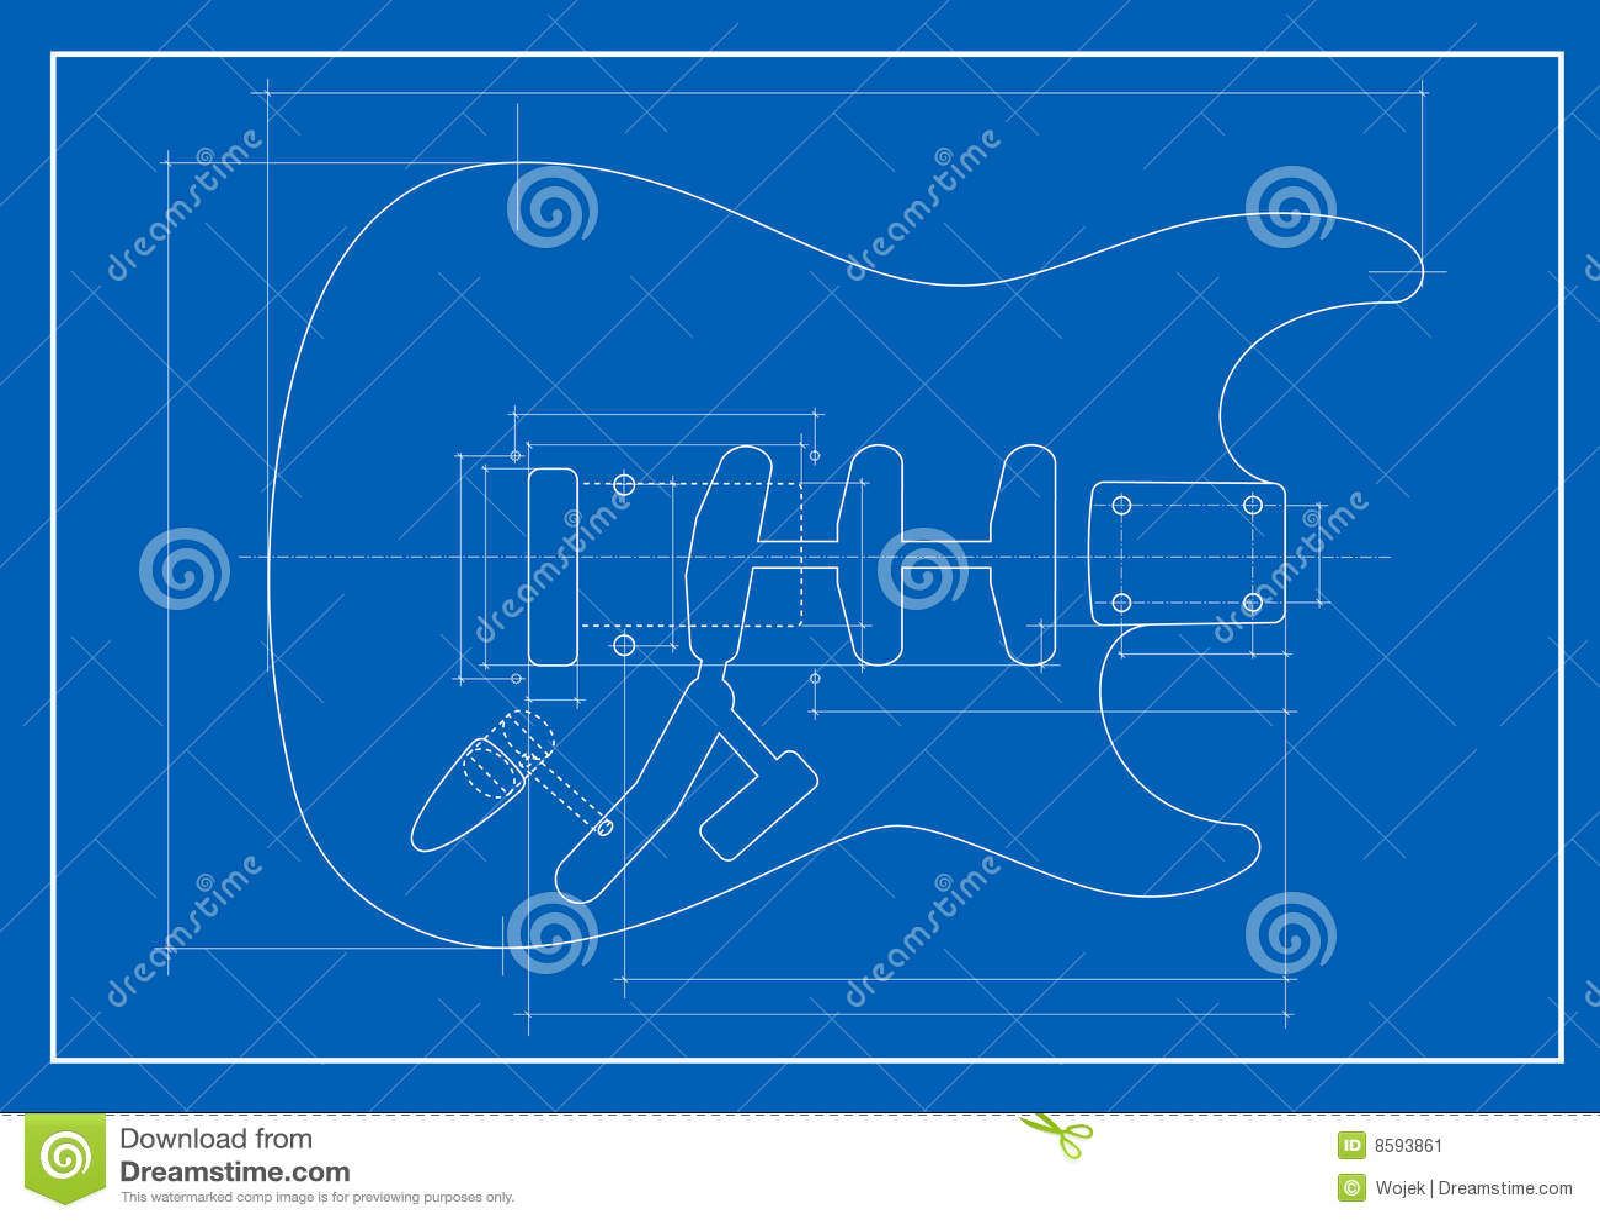 Guitar Blueprint Stock Image Image 8593861